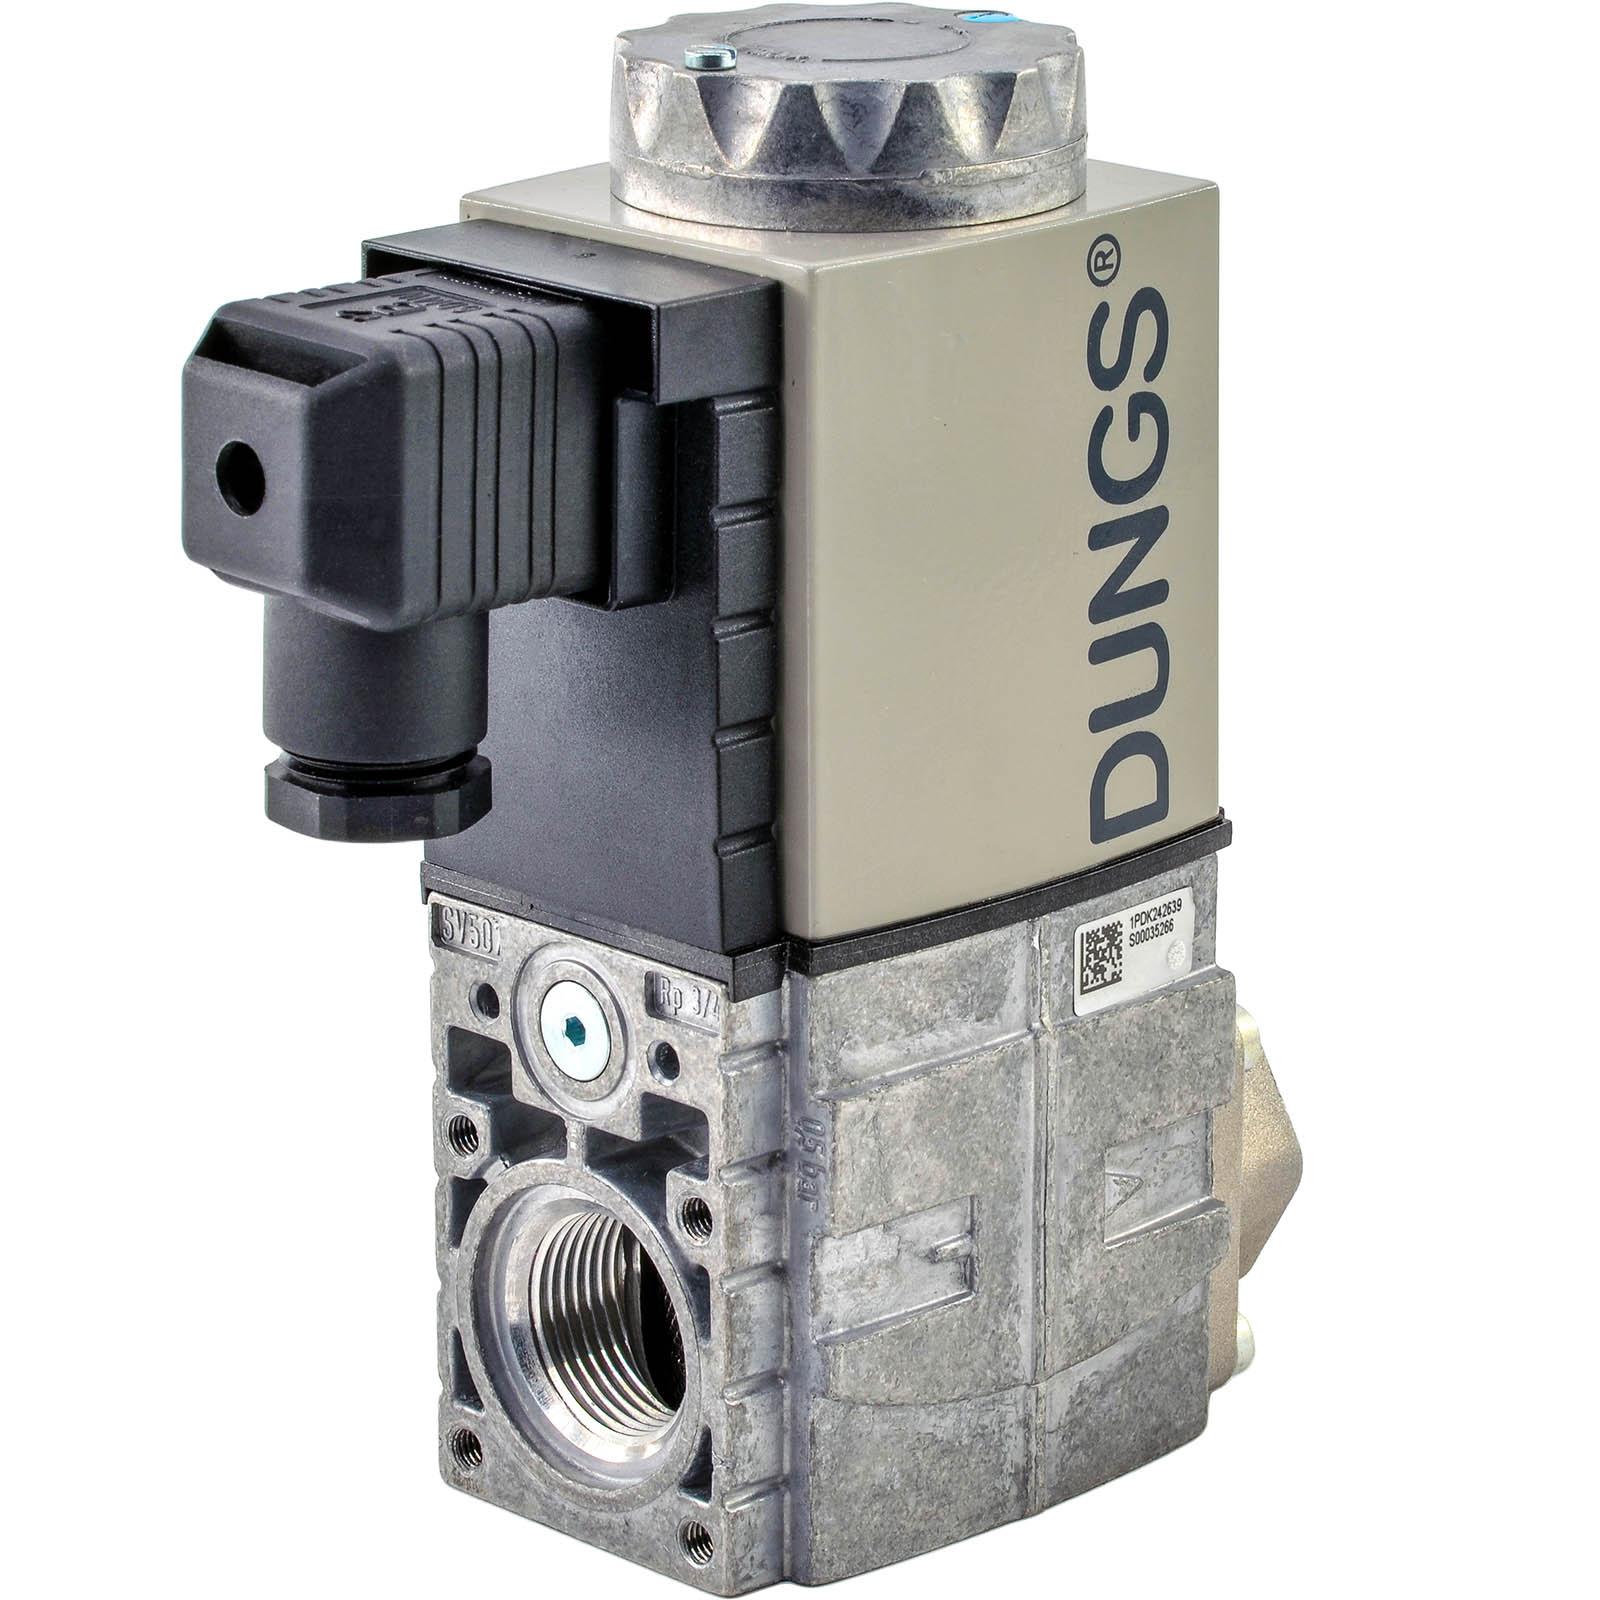 Электромагнитный клапан SV-DLE 515 DUNGS цена, купить